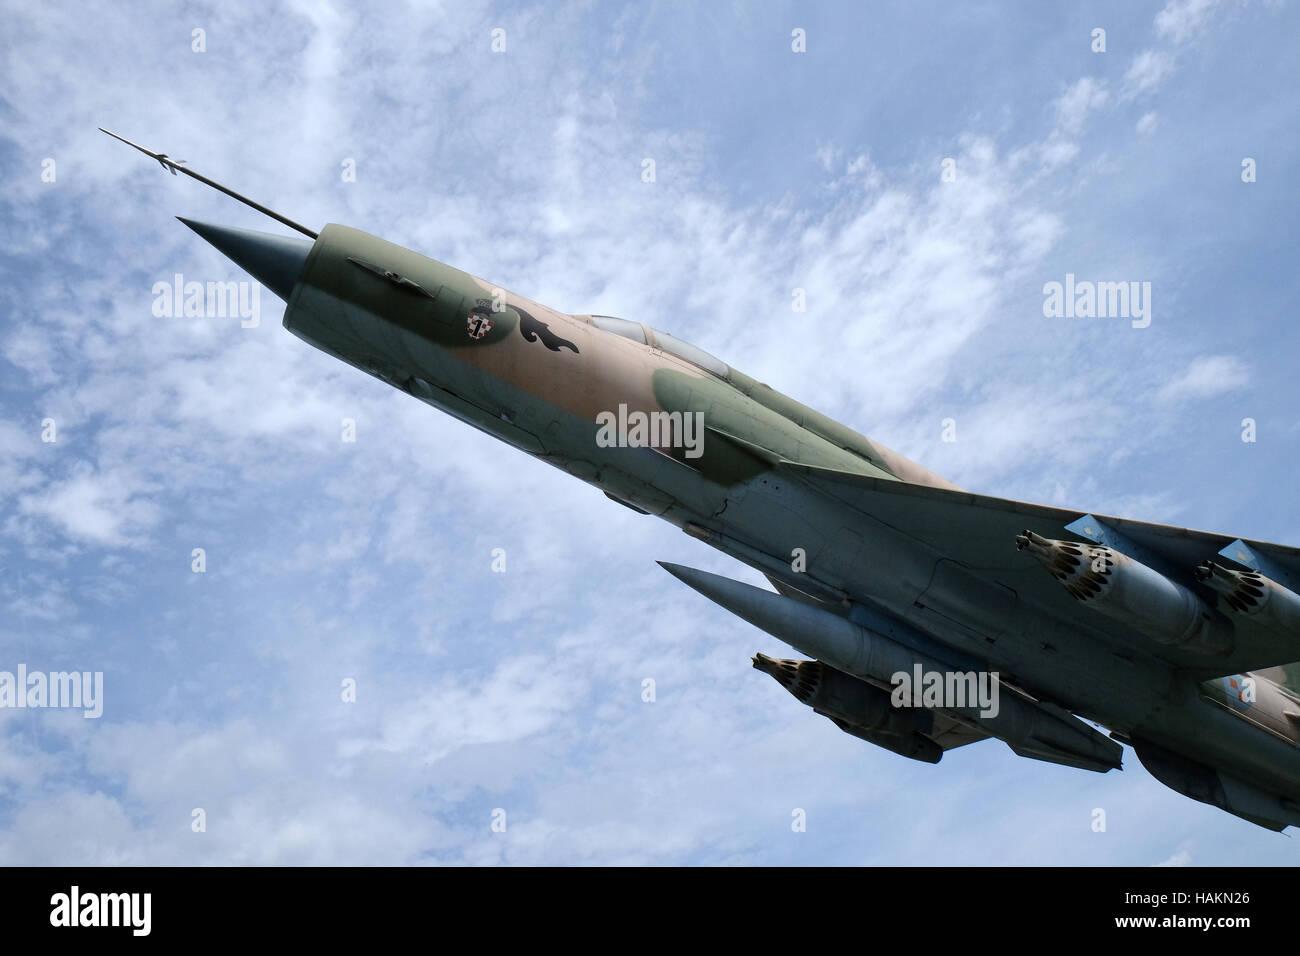 Museum of the Croatian War of Independence, 1991 - 1995, fighter Combat aircraft MIG 21, Turanj, Croatia Stock Photo